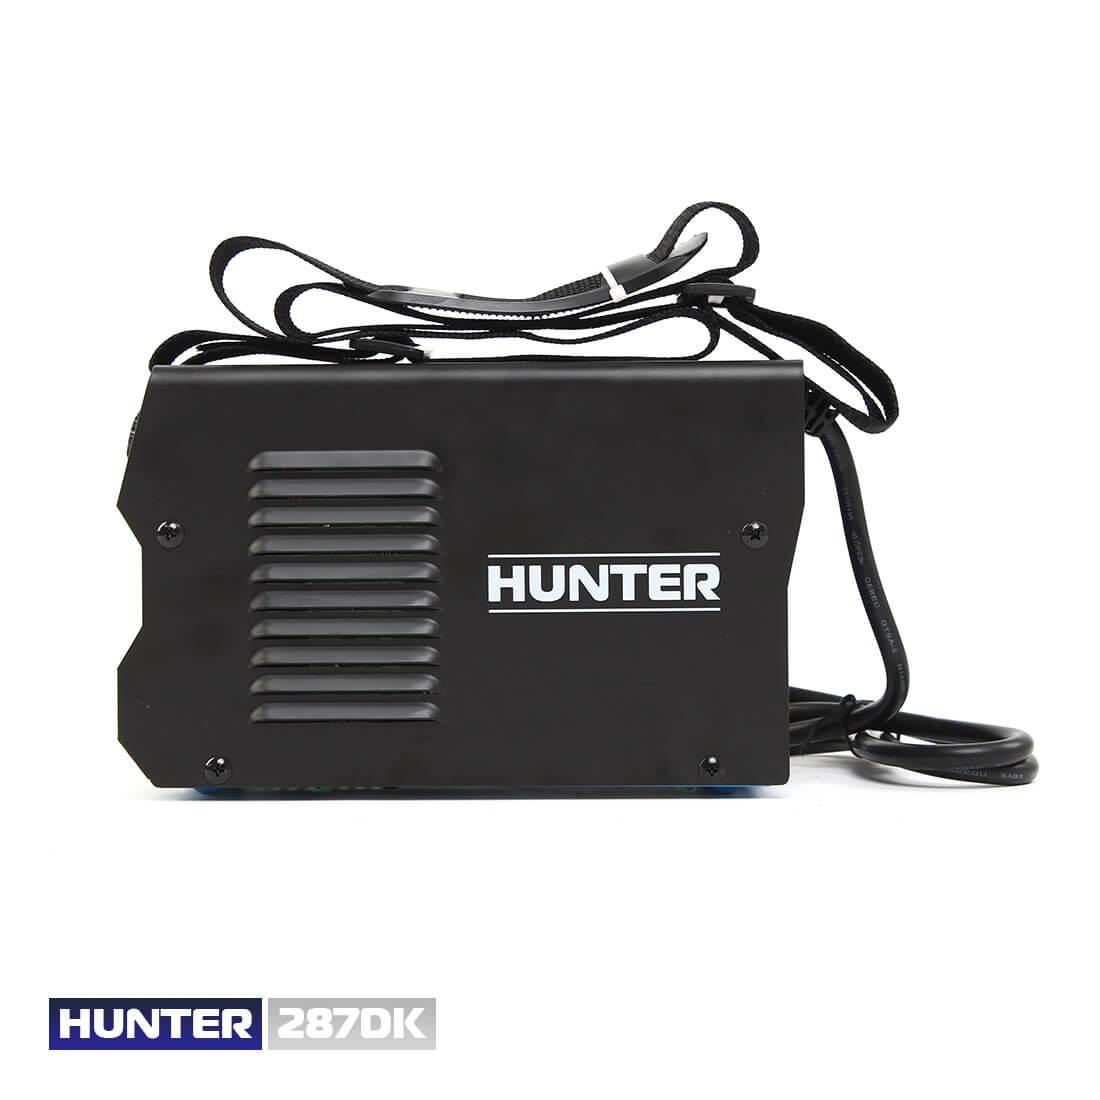 Фото Hunter MMA 287DK (дуговая) цена 2550грн №5 — Hunter